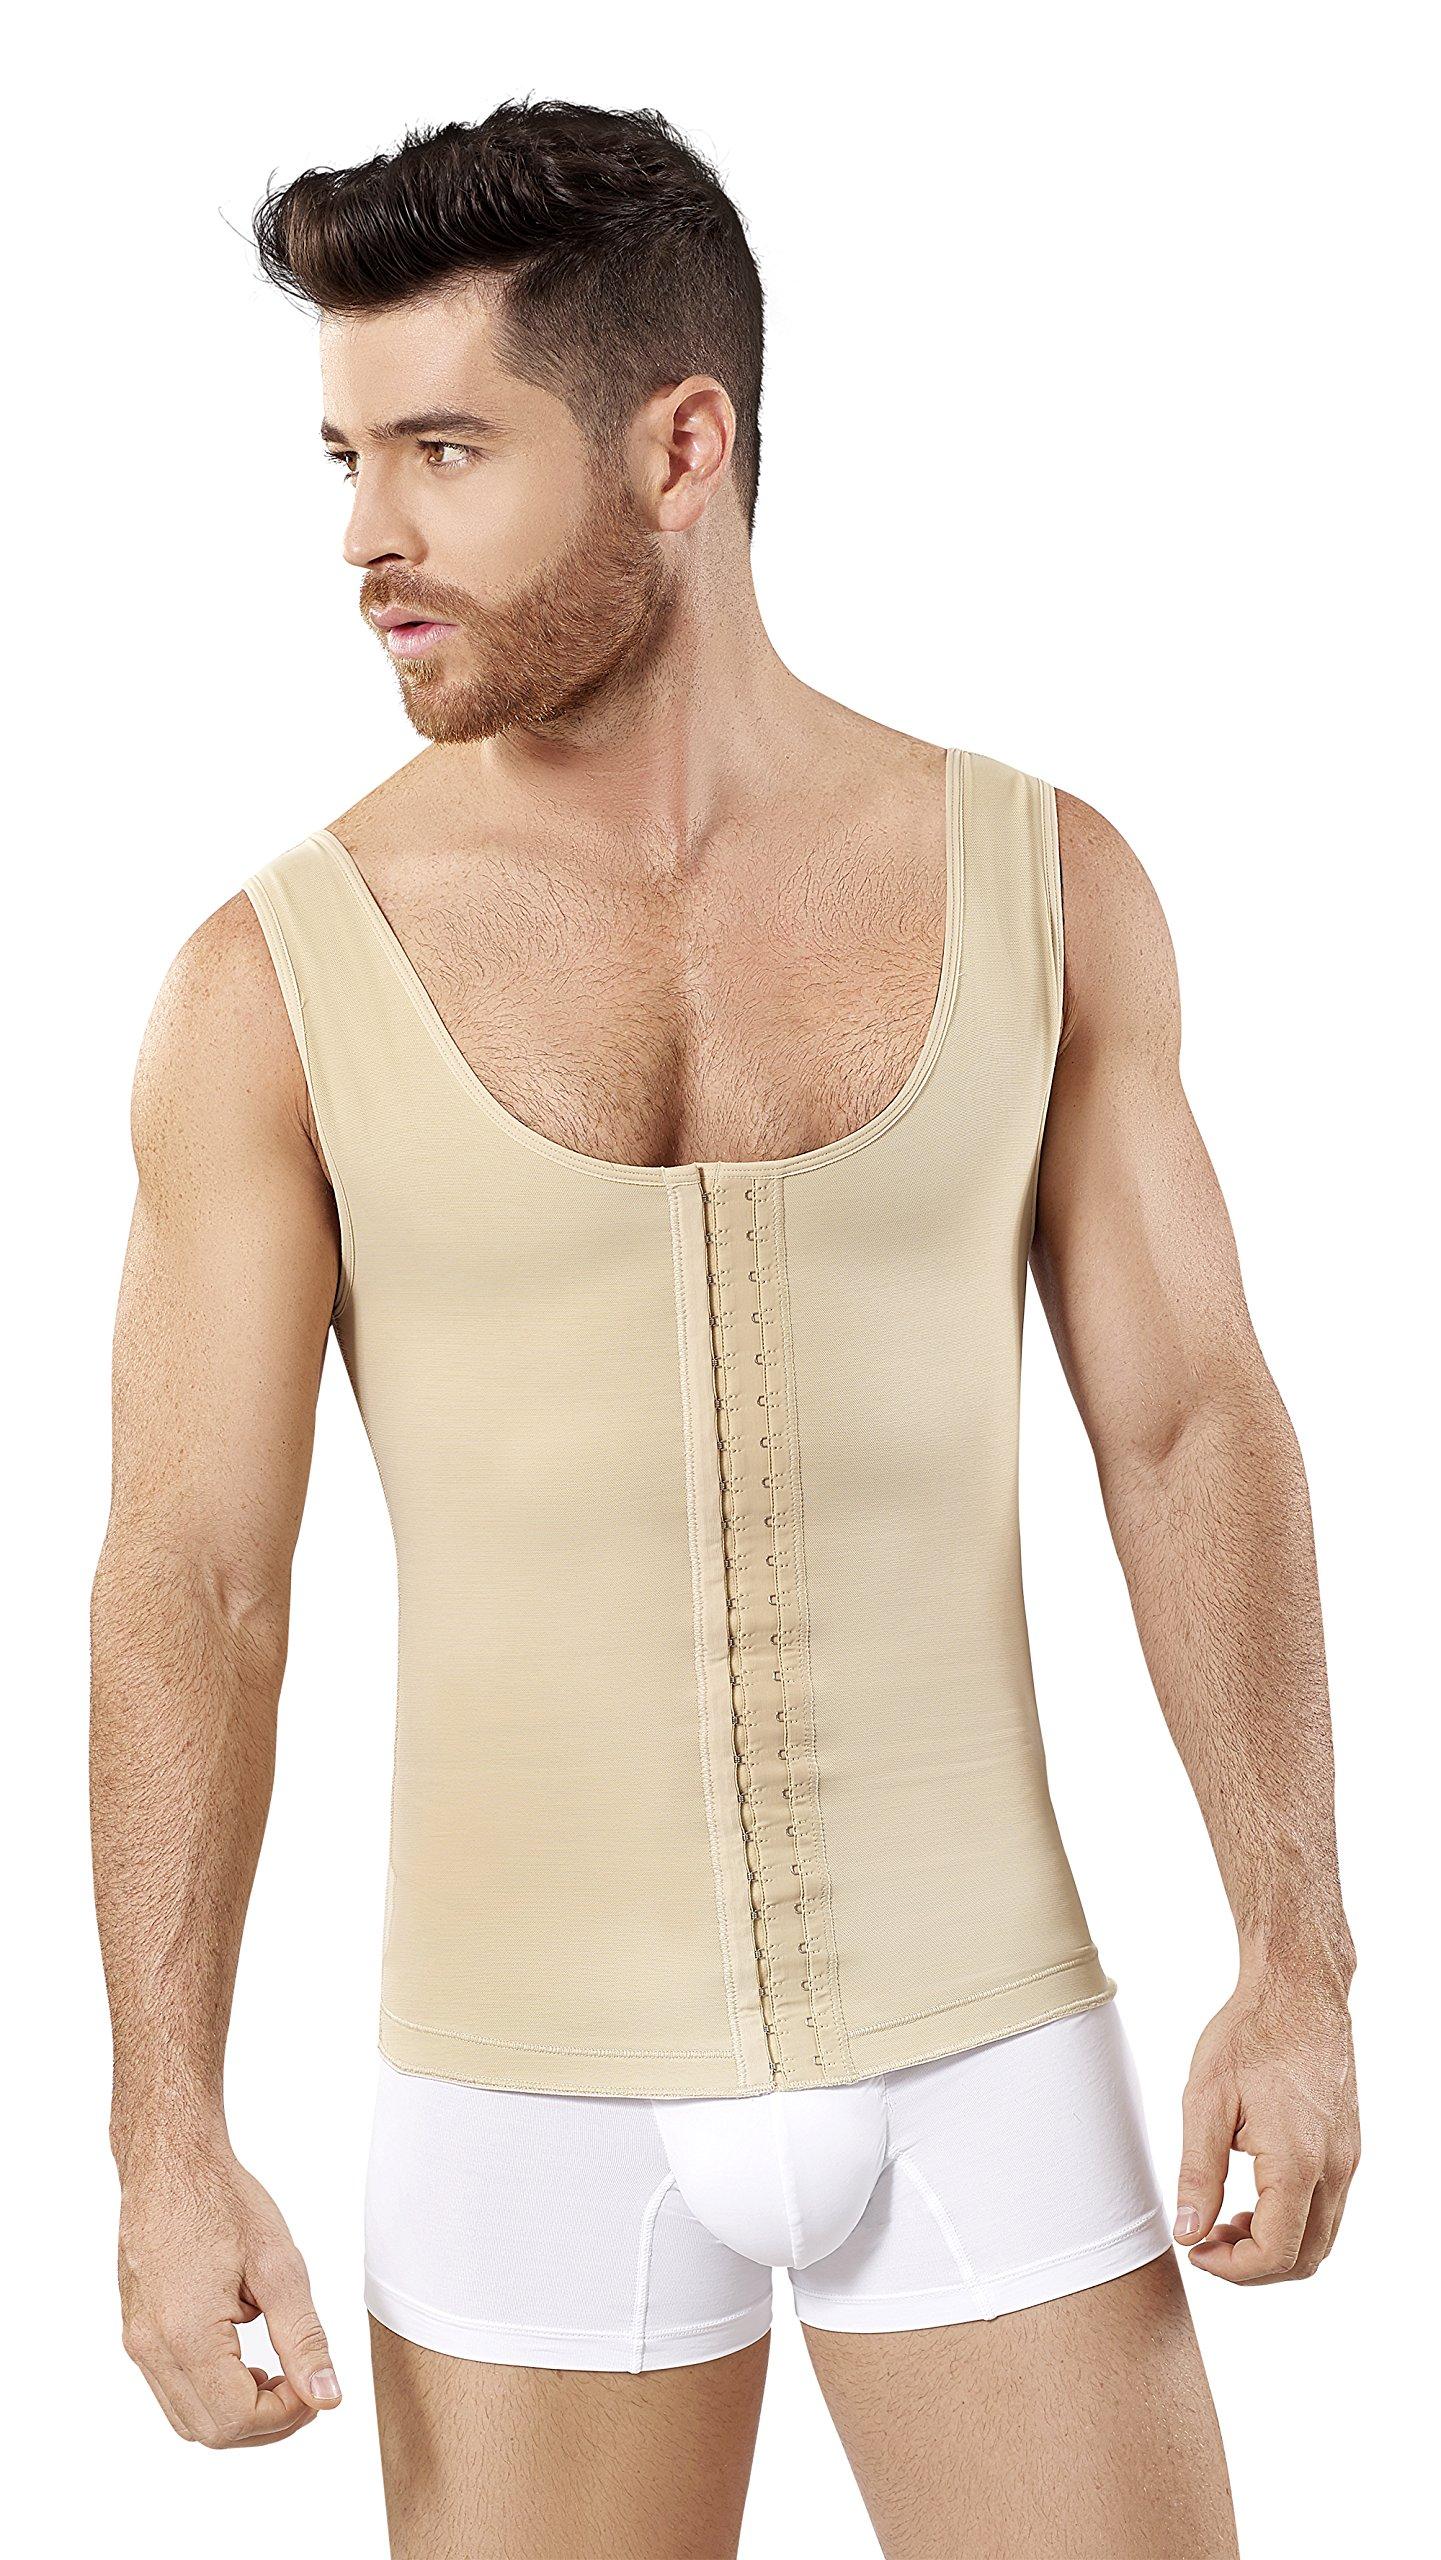 Fajas Colombianas Para Hombres Mens Girdle High Compression Garmen Shapewear Bodysuit Faja Body Shaper for Men SCH0062 (Beige, Large)